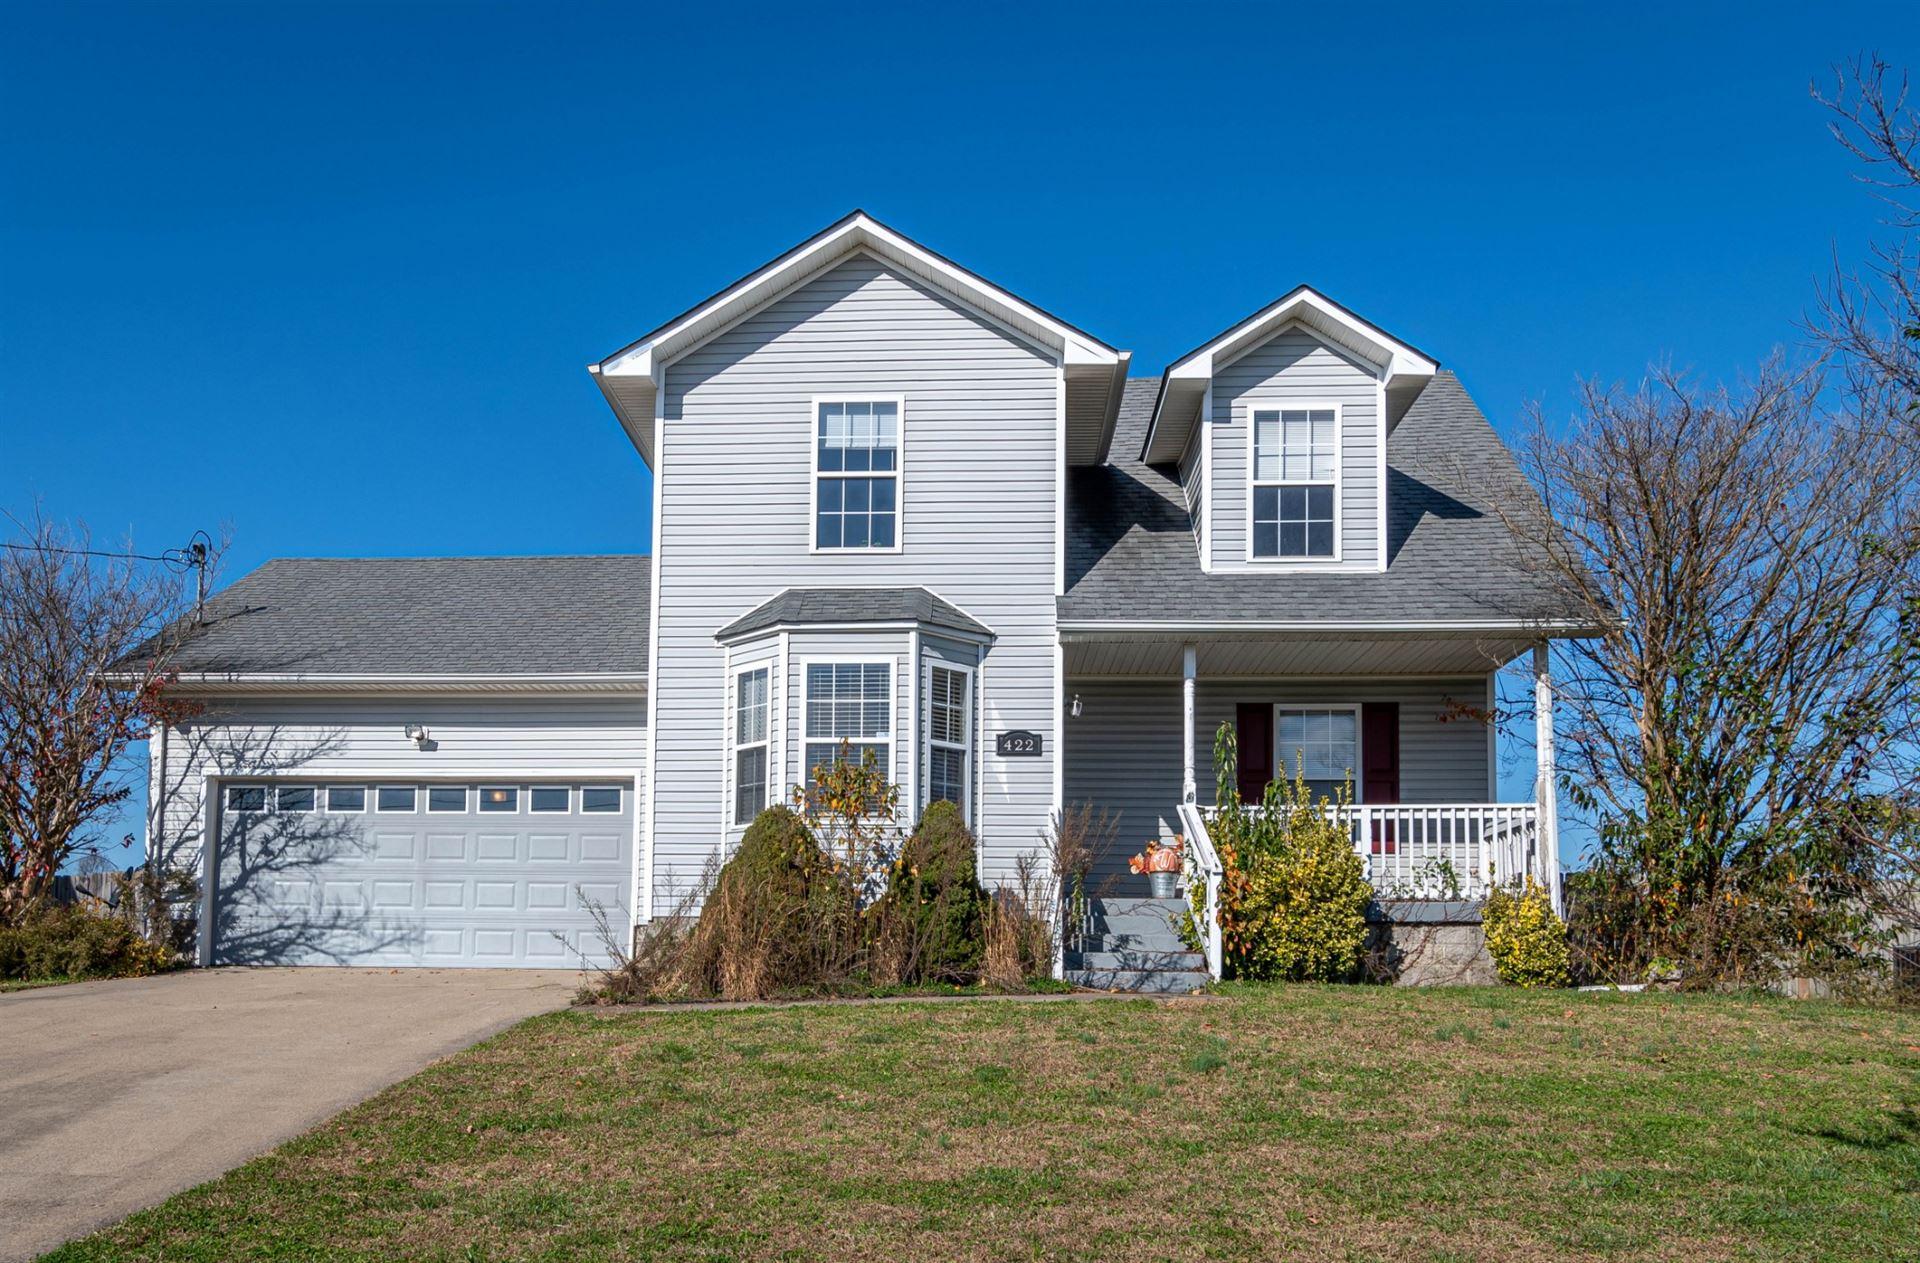 422 Filmore Rd, Oak Grove, KY 42262 - MLS#: 2207157